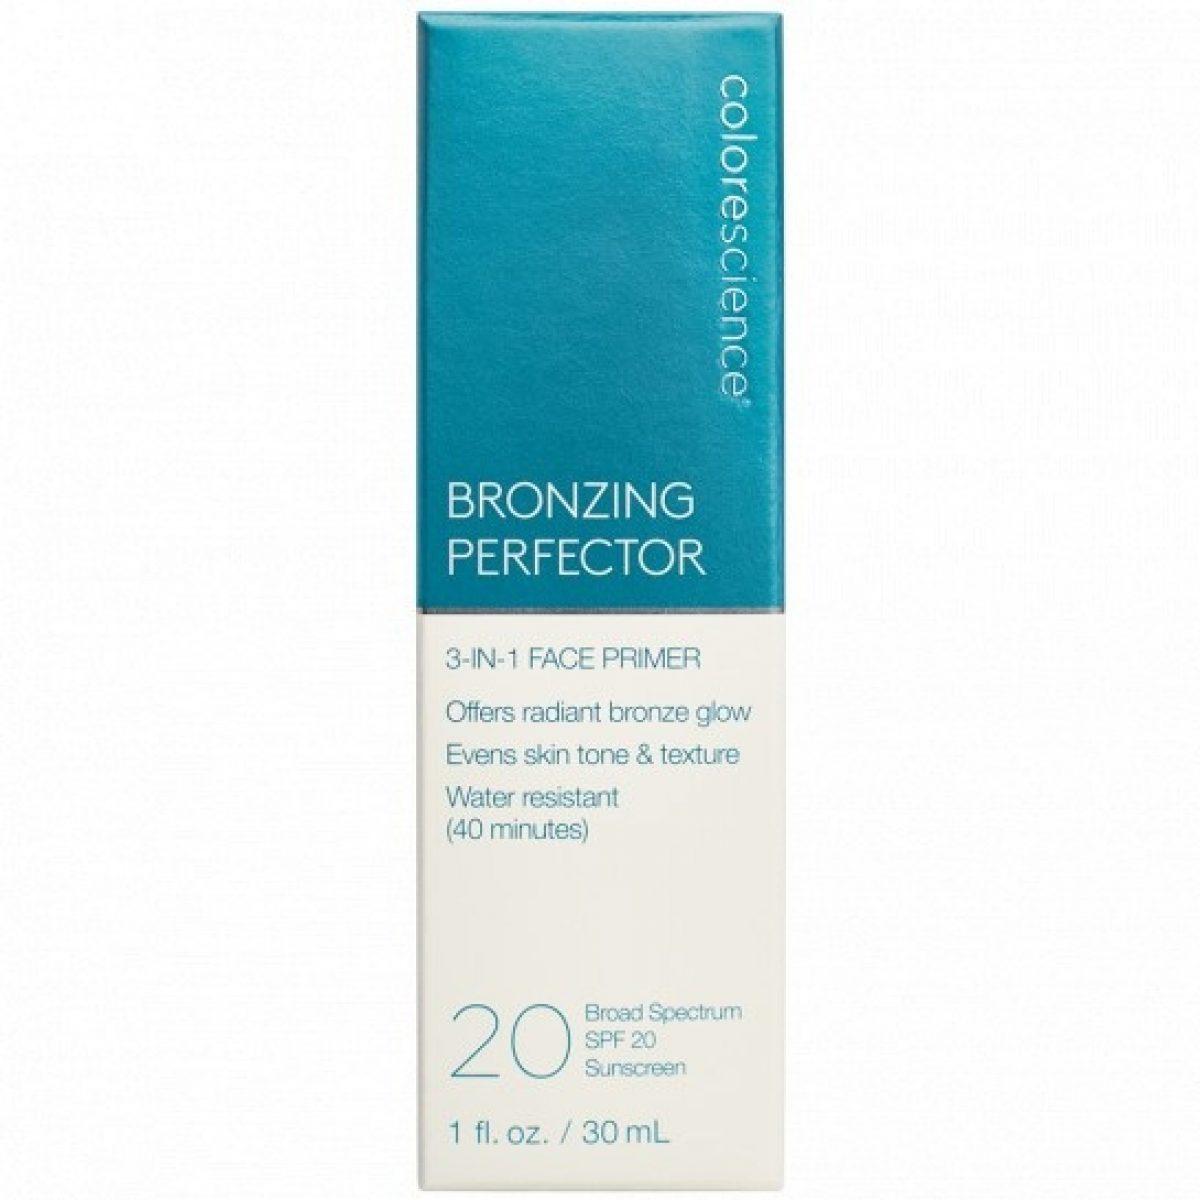 Bronzing Perfector SPF 20